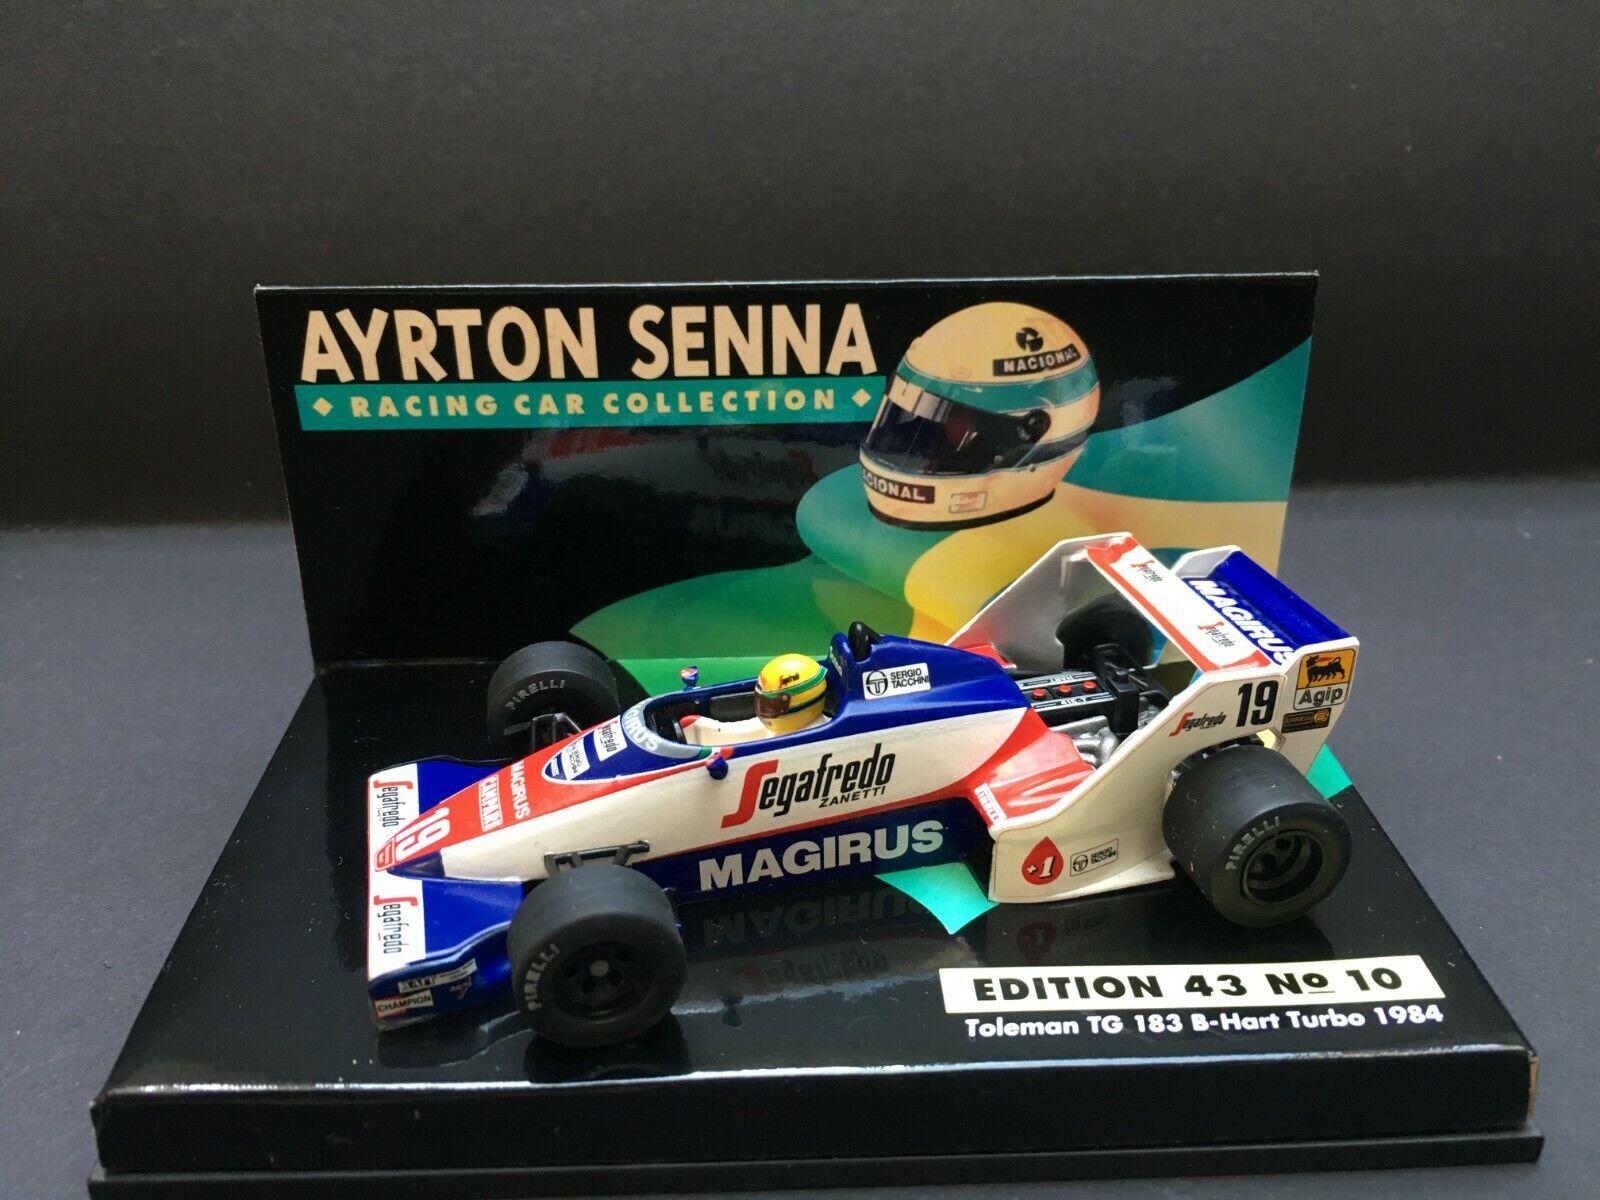 buona qualità Minichamps - Ayrton Senna - Toleuomo Toleuomo Toleuomo - TG 183B  - 1 43 - 198 - ASC 10  qualità autentica